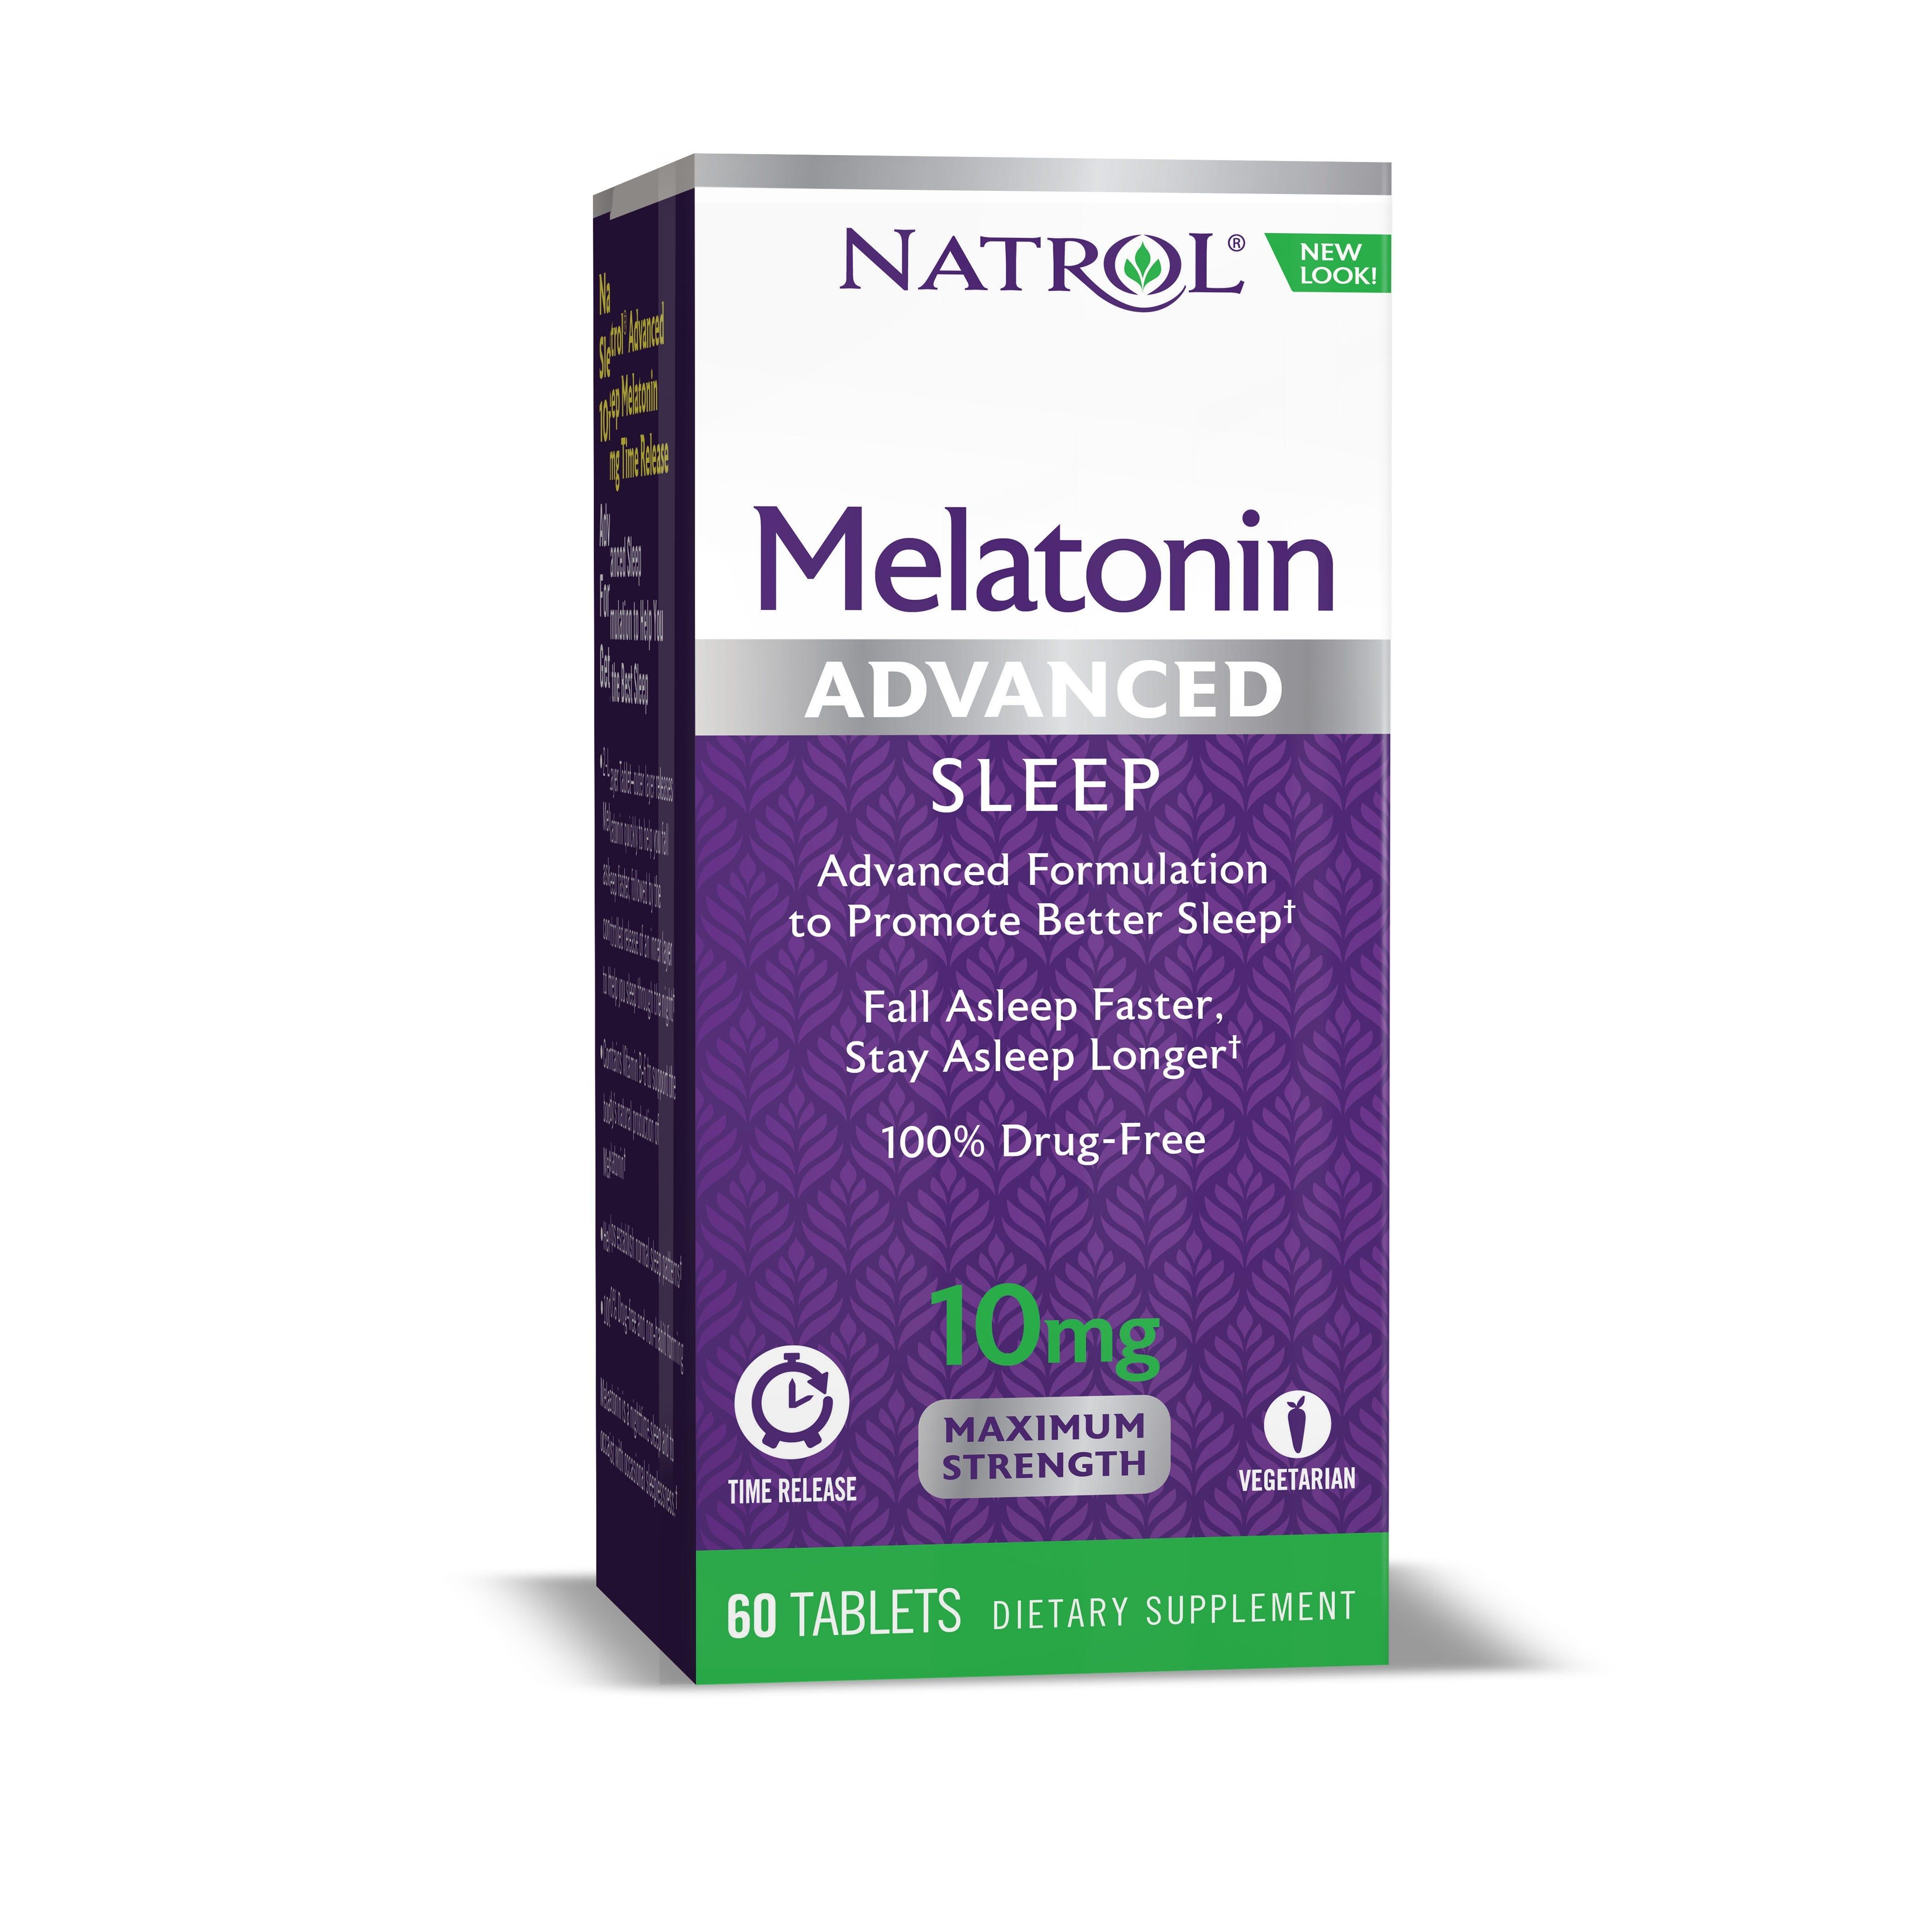 Image of Natrol Melatonin Advanced Sleep Tablets, Maximum Strength, 10mg - 60 ct